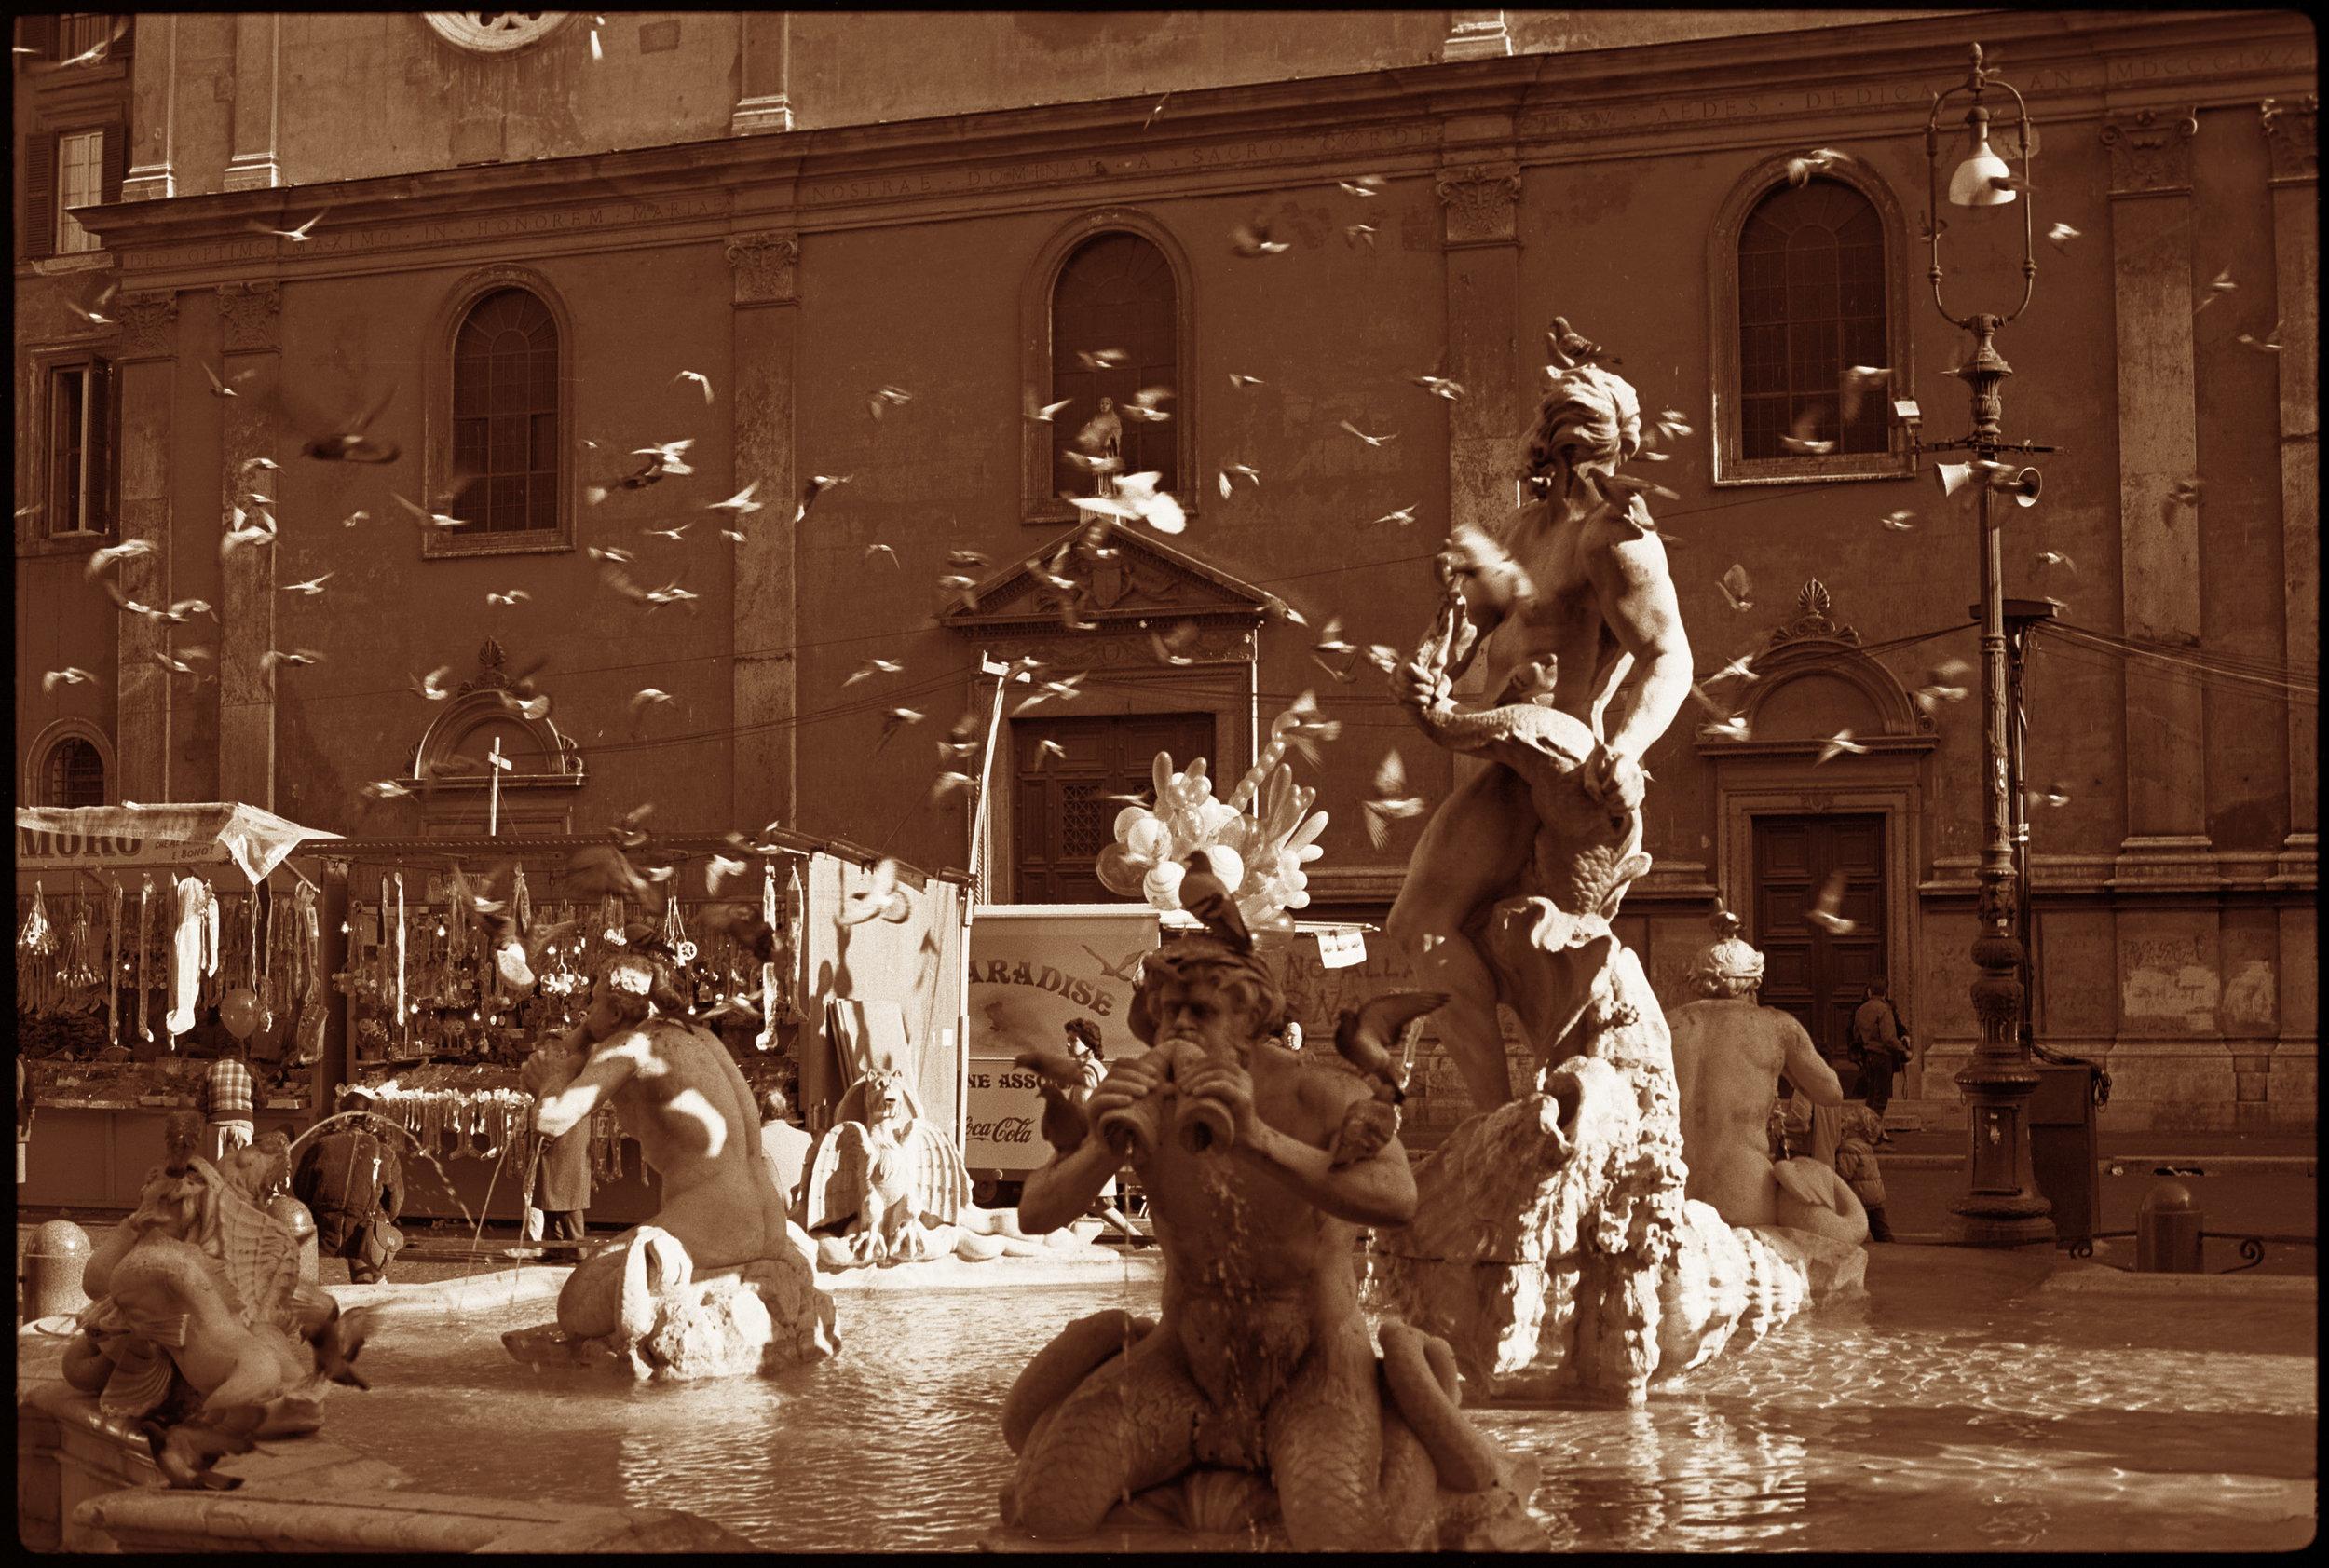 03_piazza navonna_lg.jpg